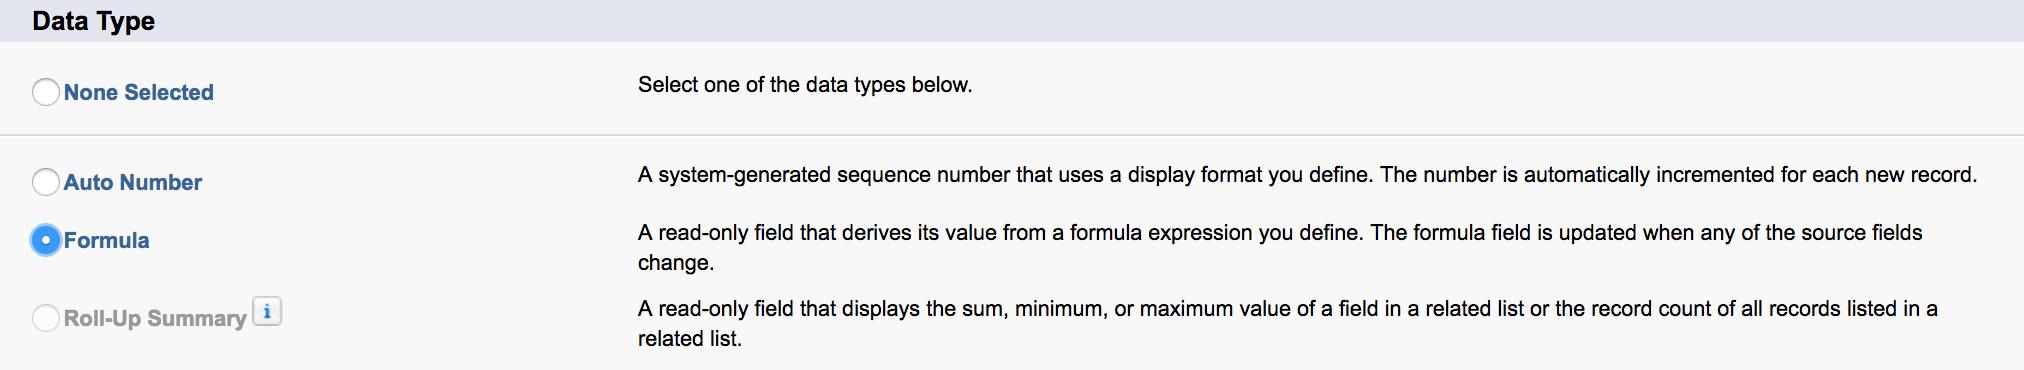 formula data type